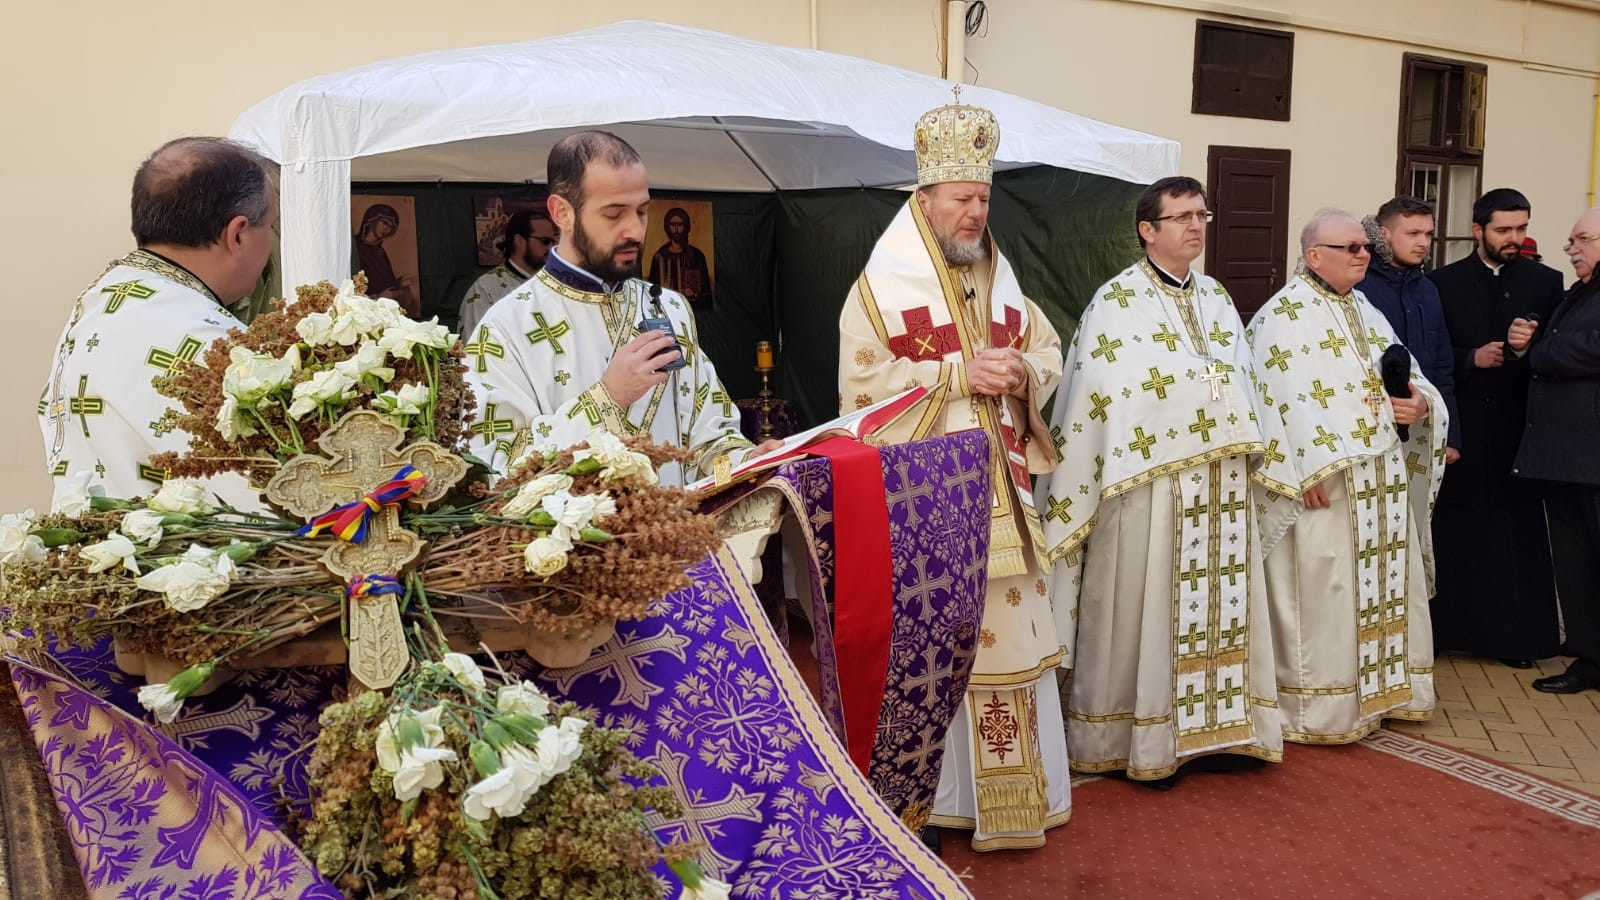 (FOTO) Duminica Sfintei Cruci. Asumarea Crucii - sensul vieții noastre